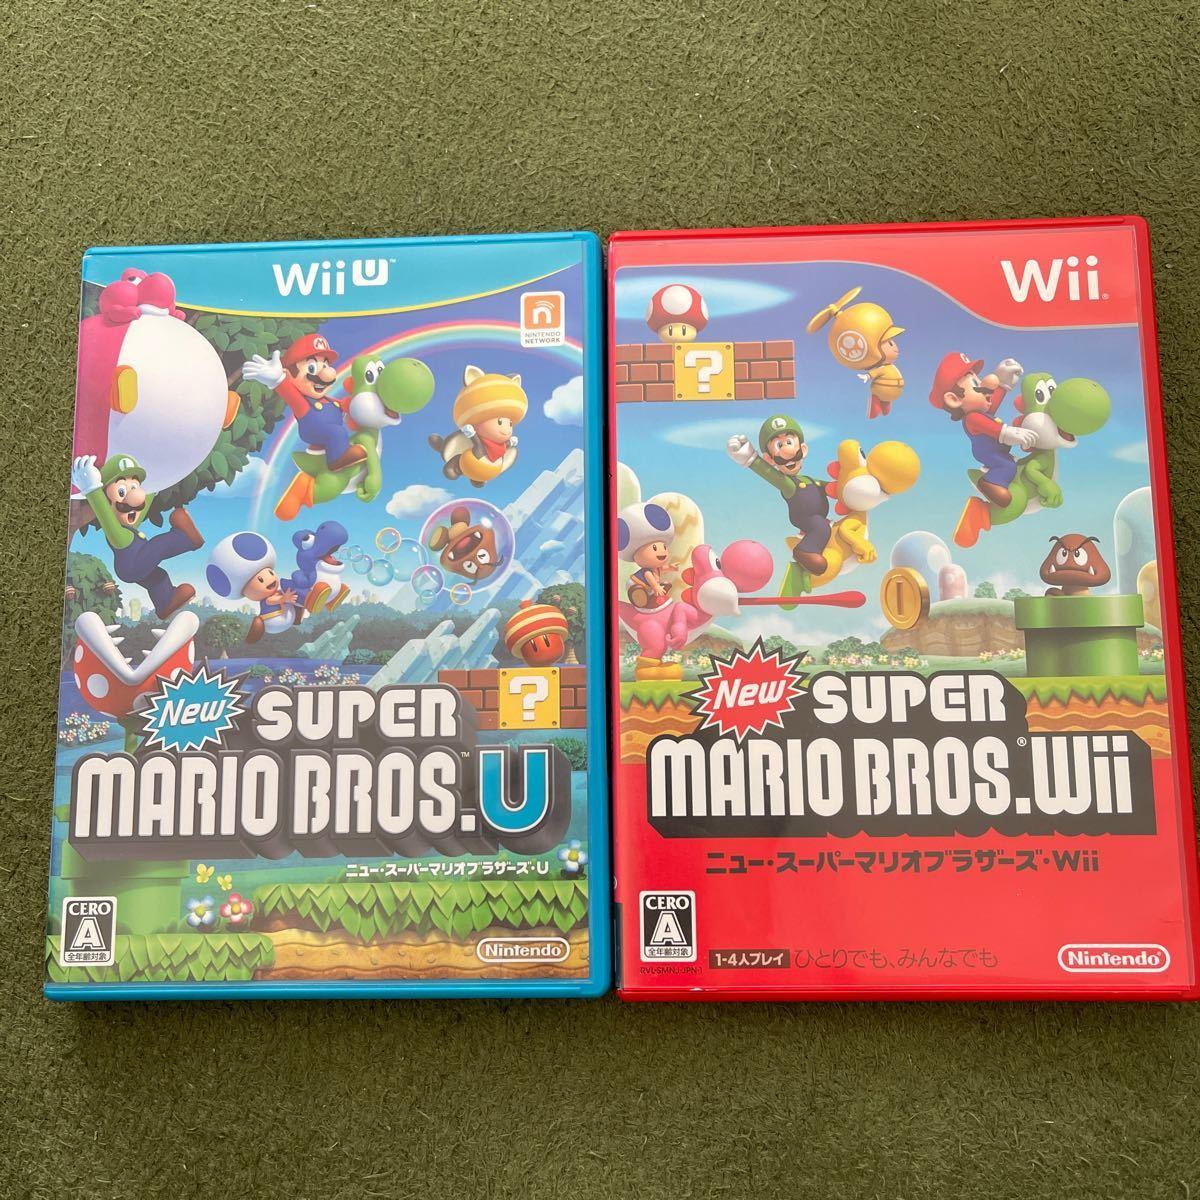 Newスーパーマリオブラザーズ WiiU ソフト